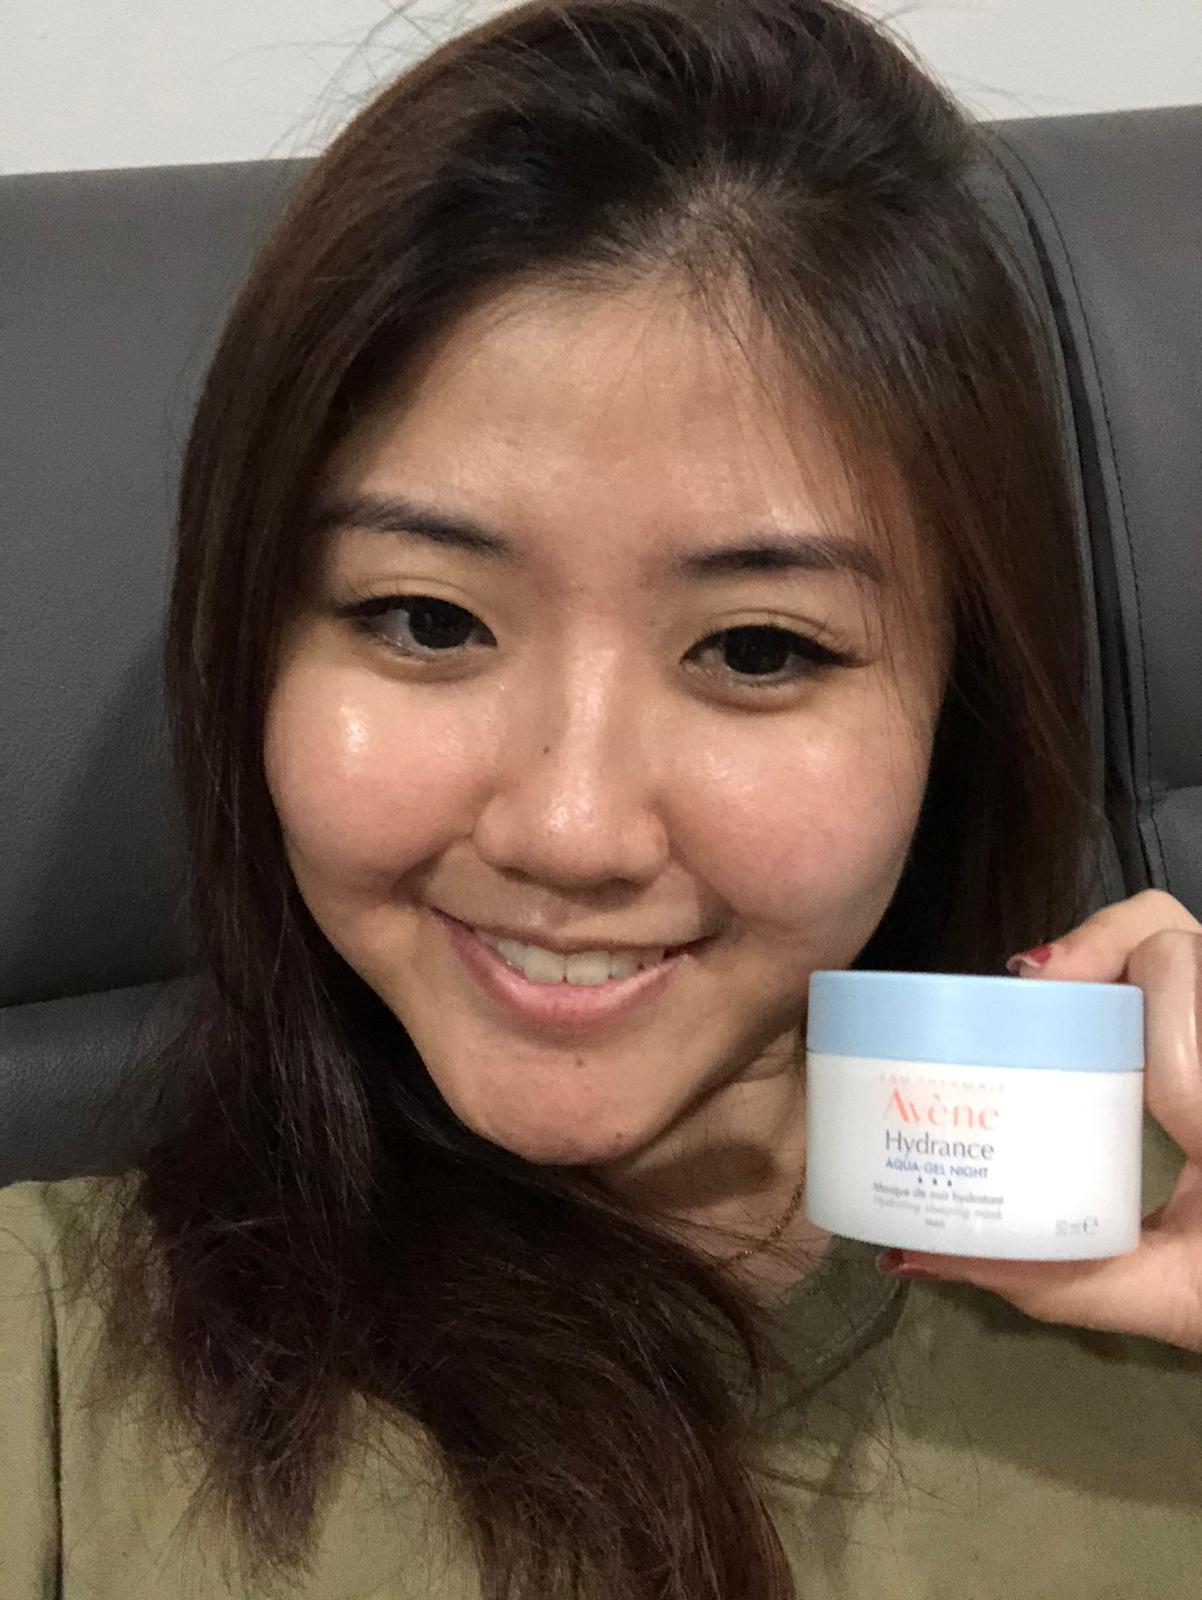 Avène Hydrance Aqua Gel Night Hydrating Sleeping Mask Jacqueline Goh